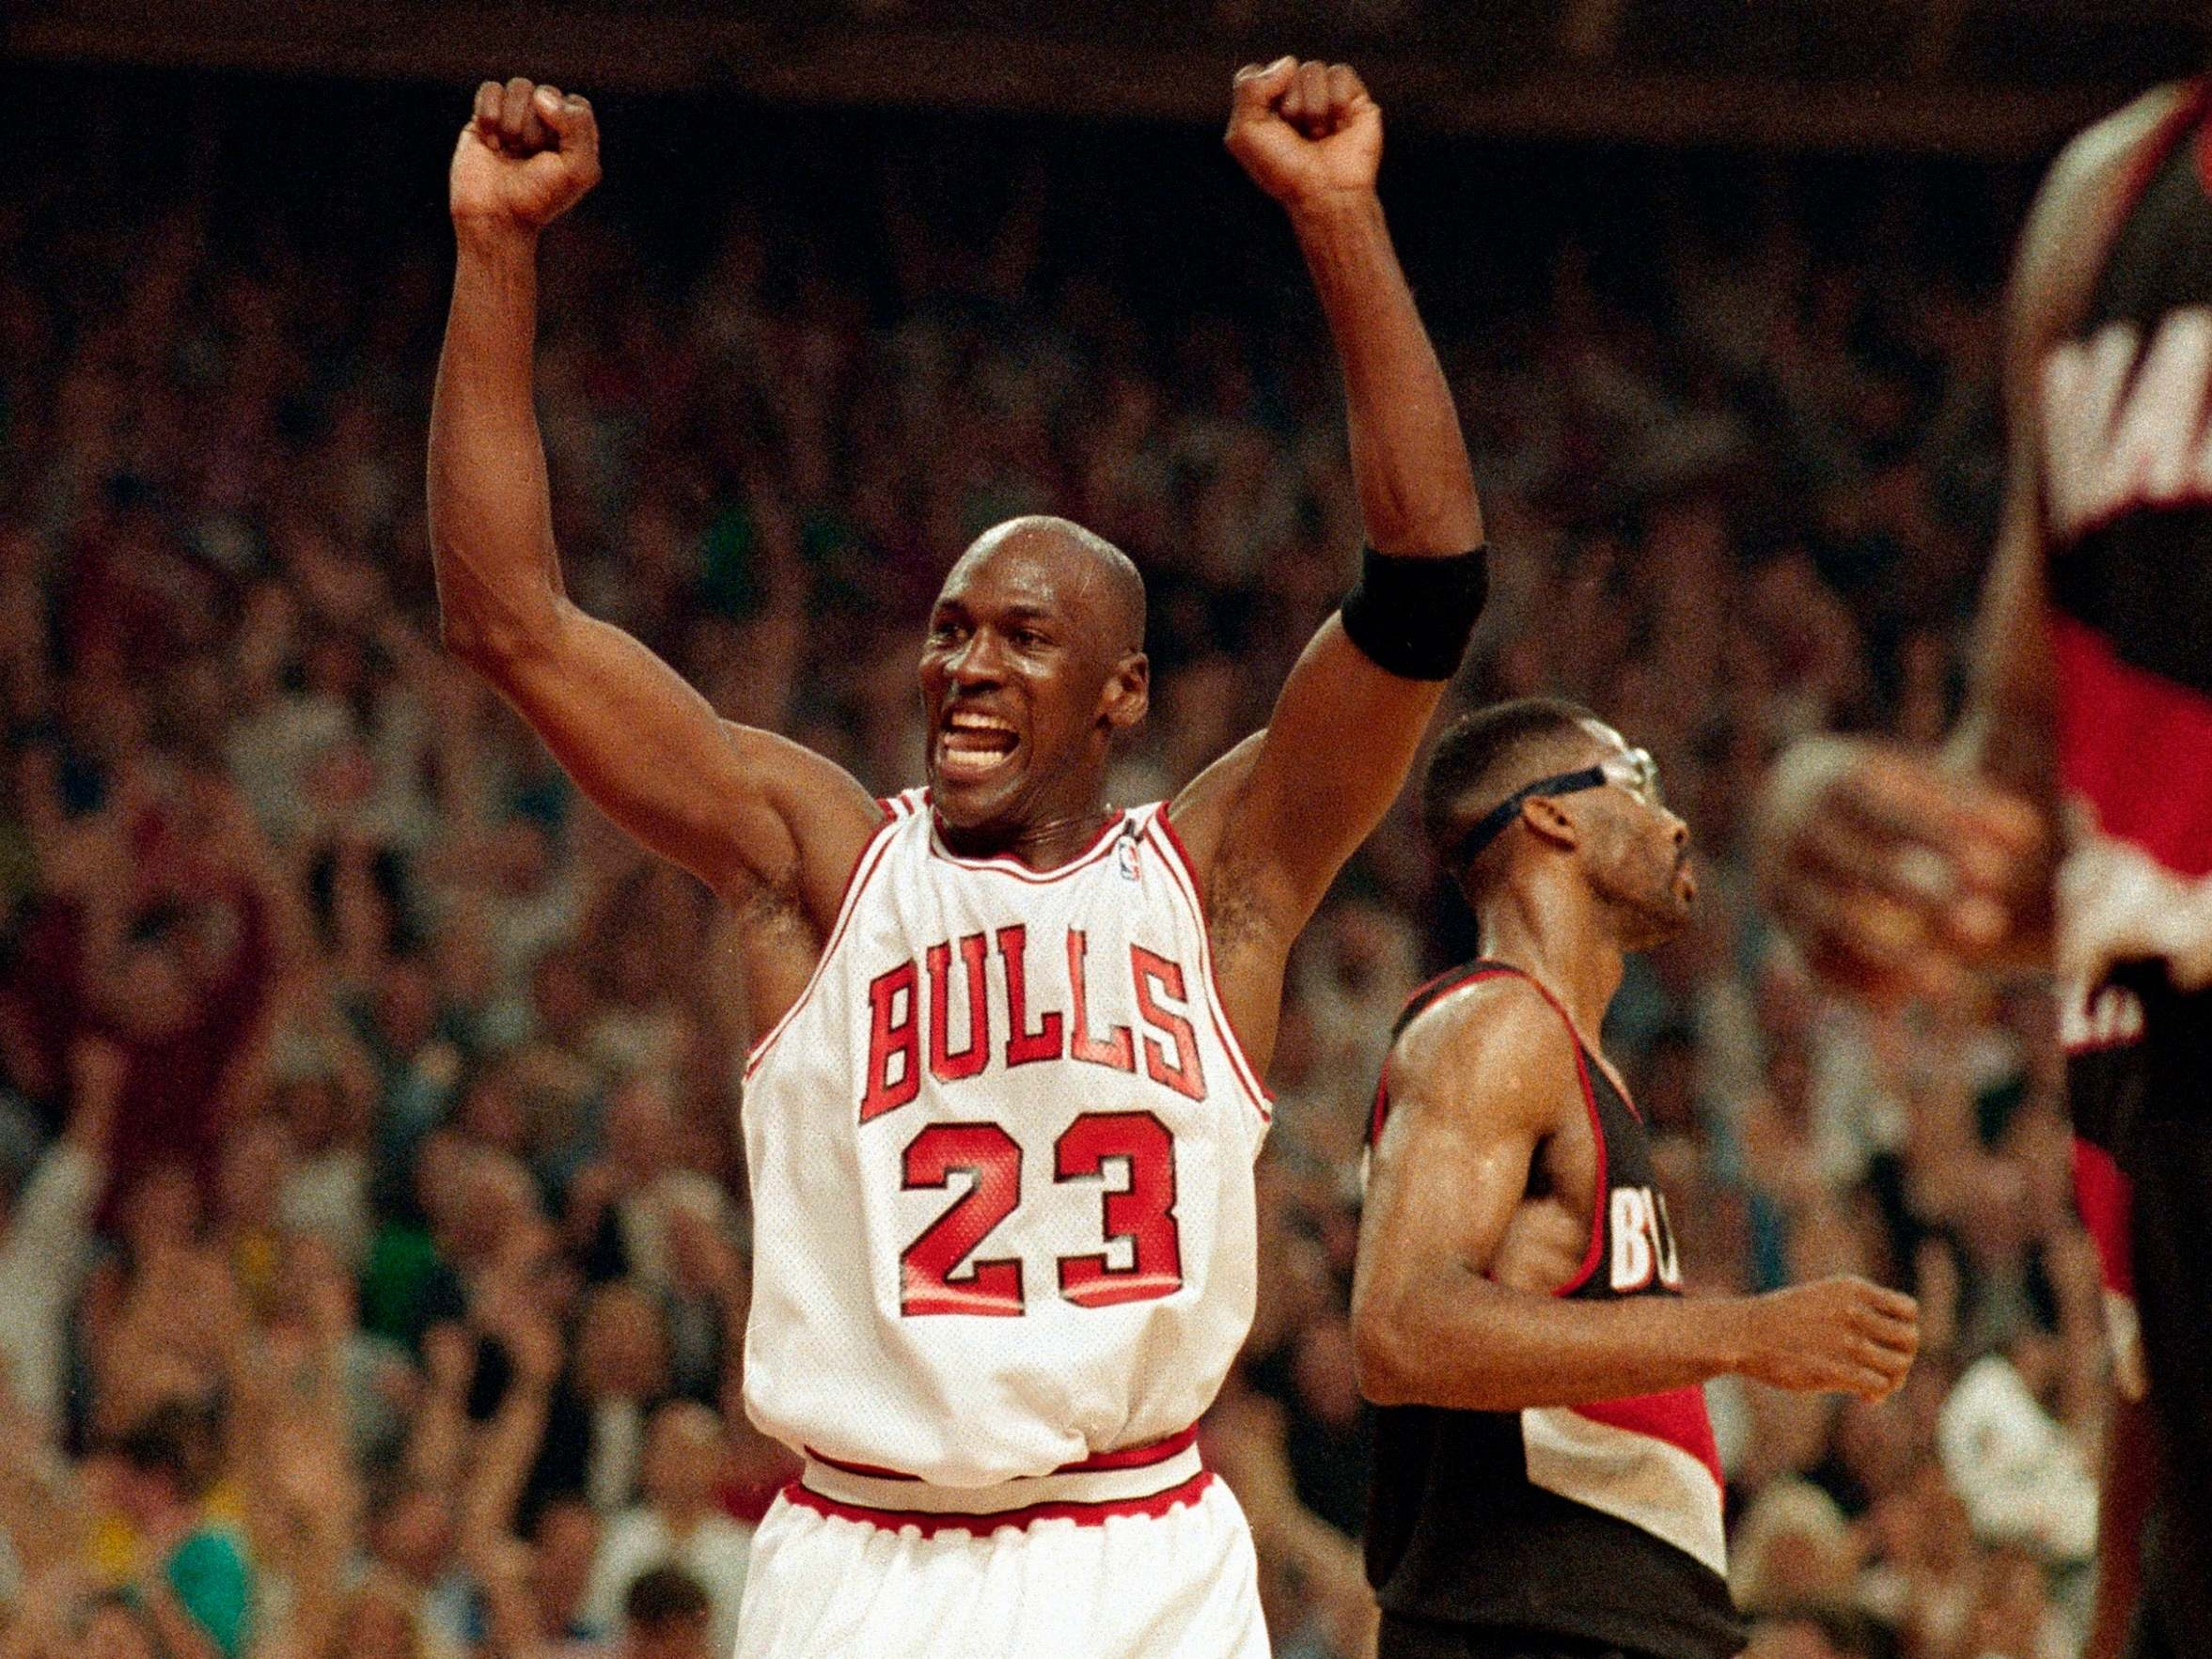 Michael Jordan addresses rumours of gambling suspension during 'The Last Dance'